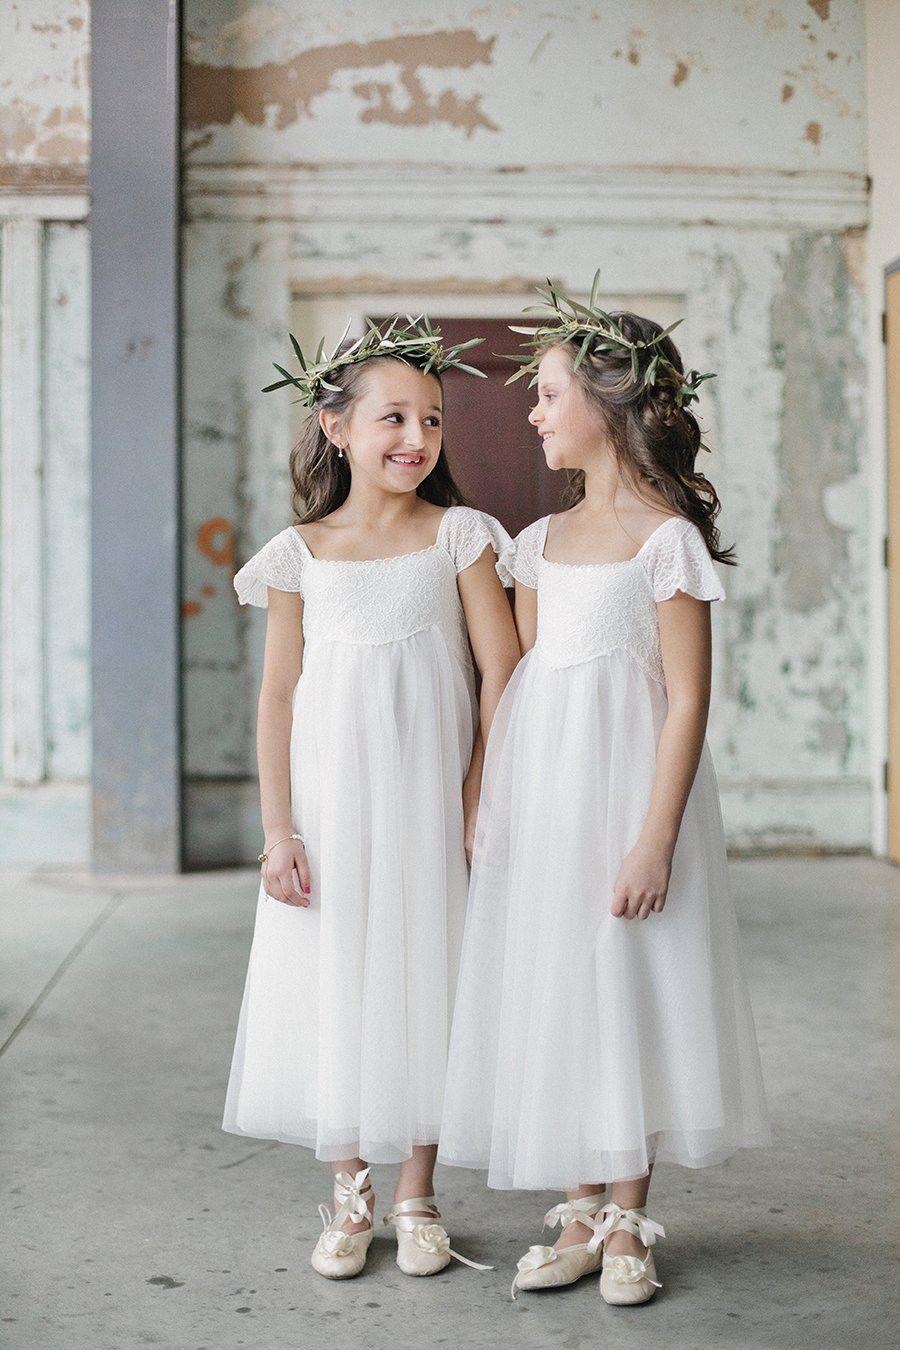 Princess LaceuMesh Cap Sleeves White Flower Girl Dresses FL